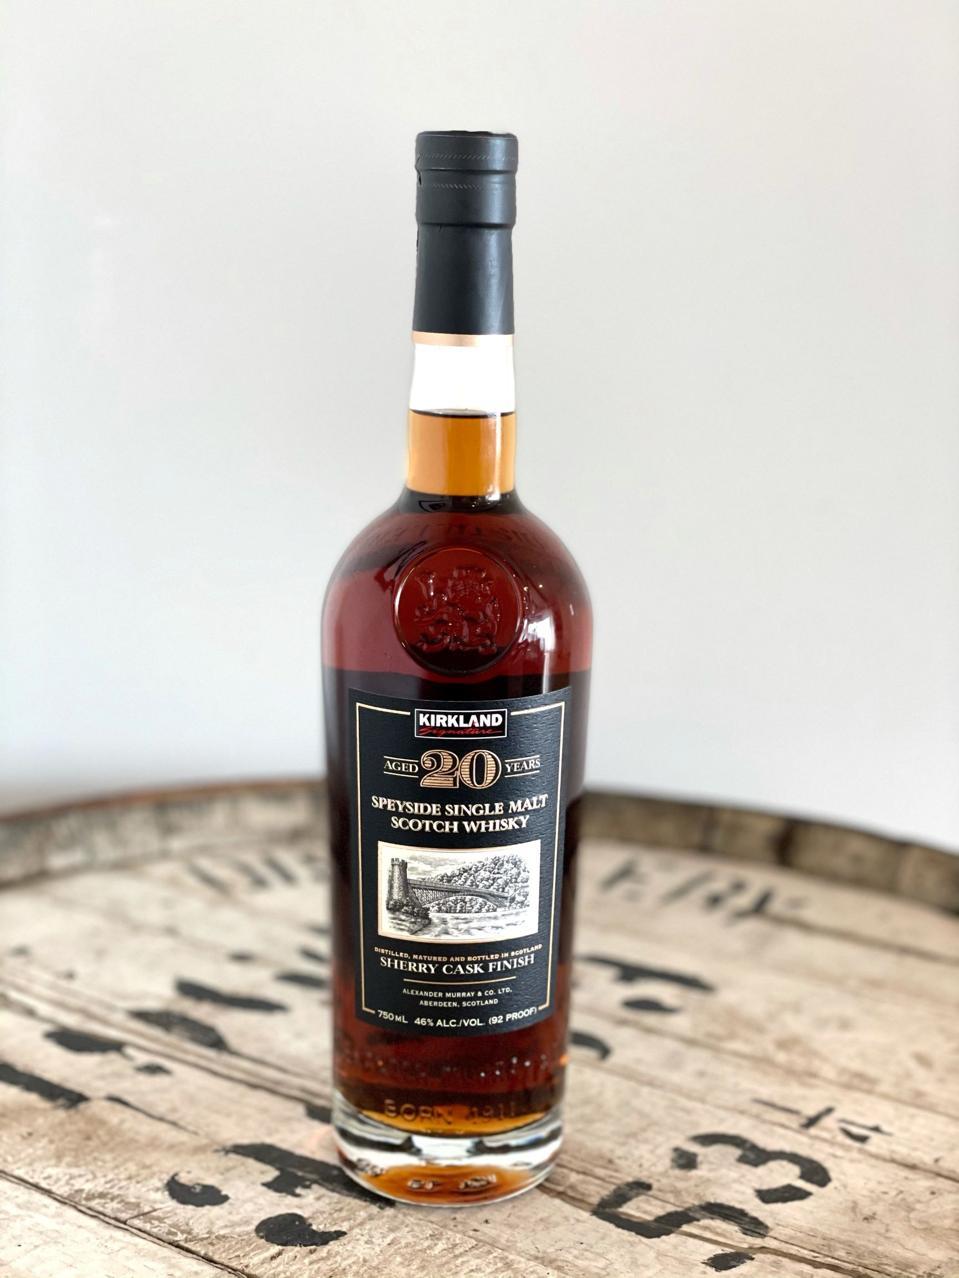 Kirkland Signature, 20 YO, Speyside Single Malt Scotch Whisky